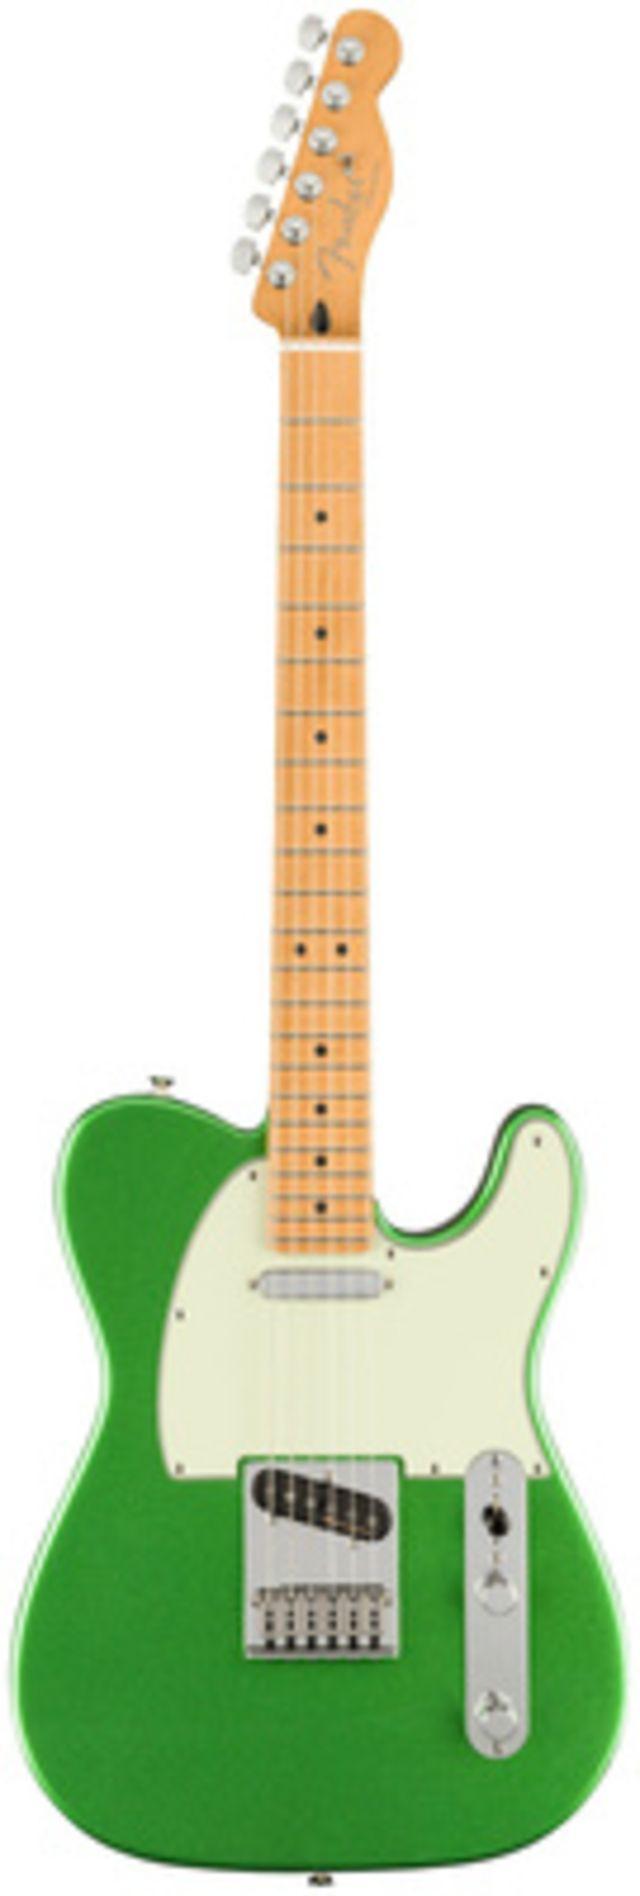 Fender Player Plus Tele MN CosmicJade